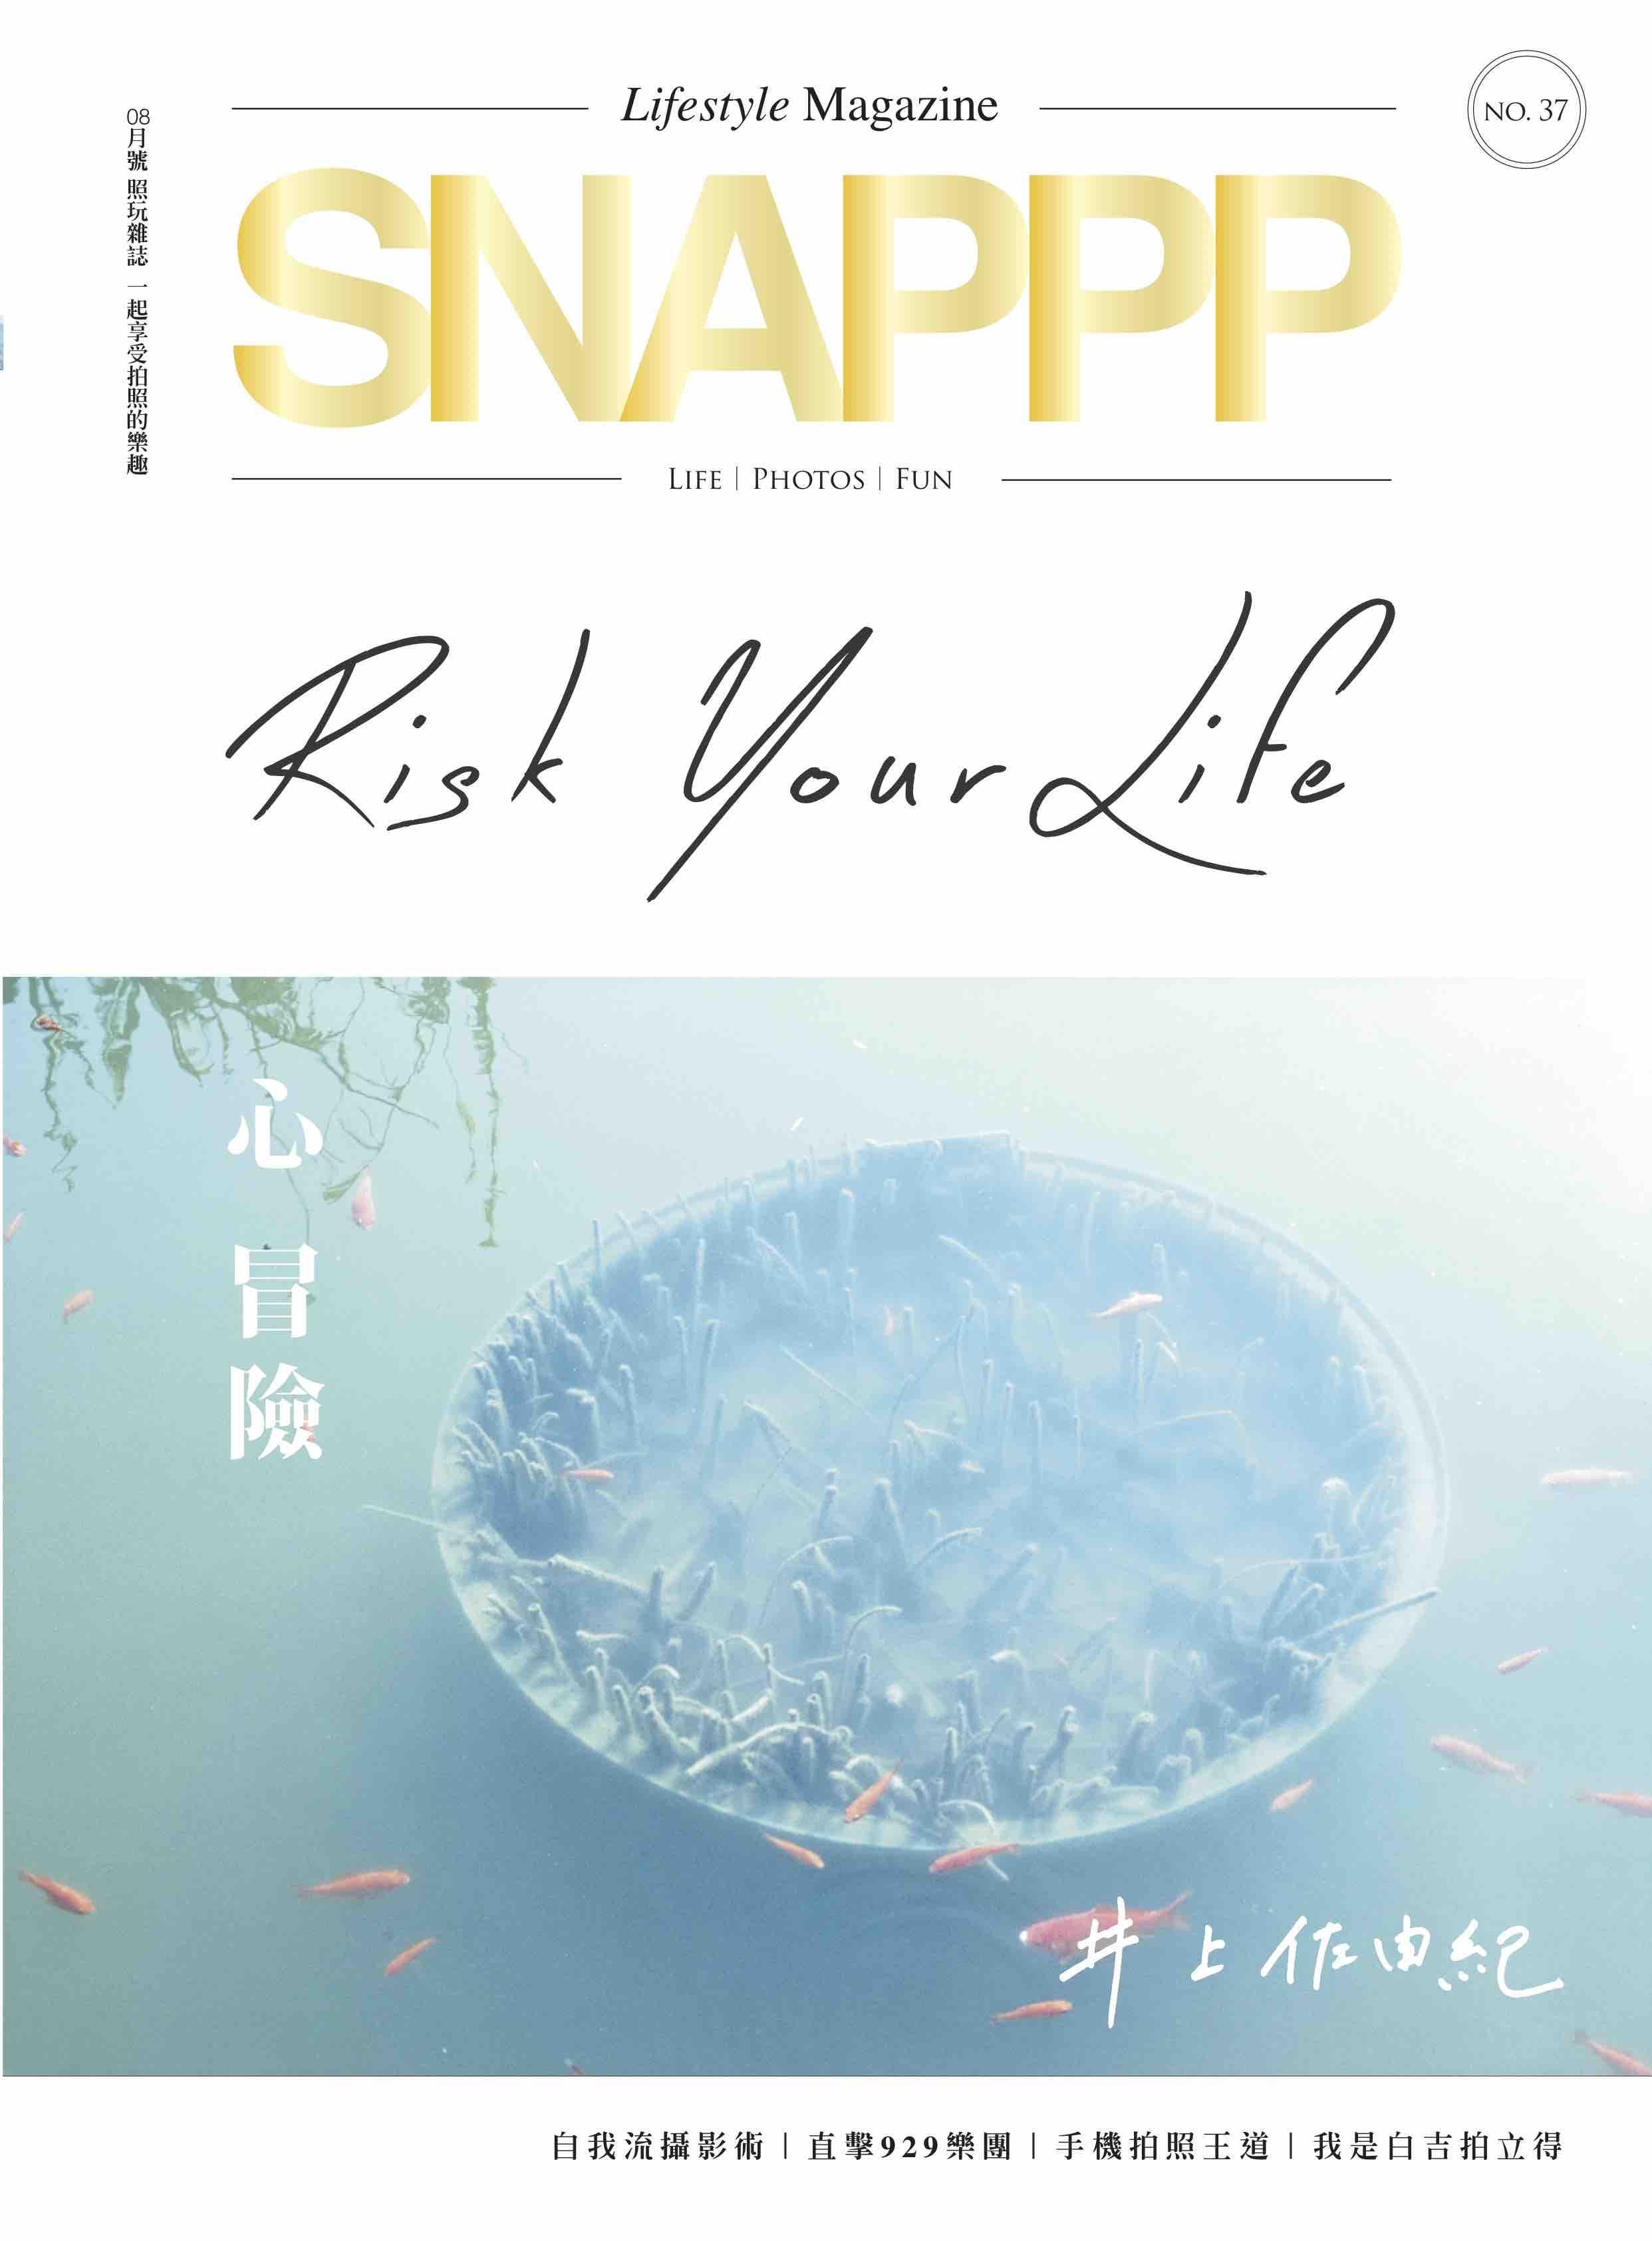 SNAPPP-NO37 COVER-ver2.jpg